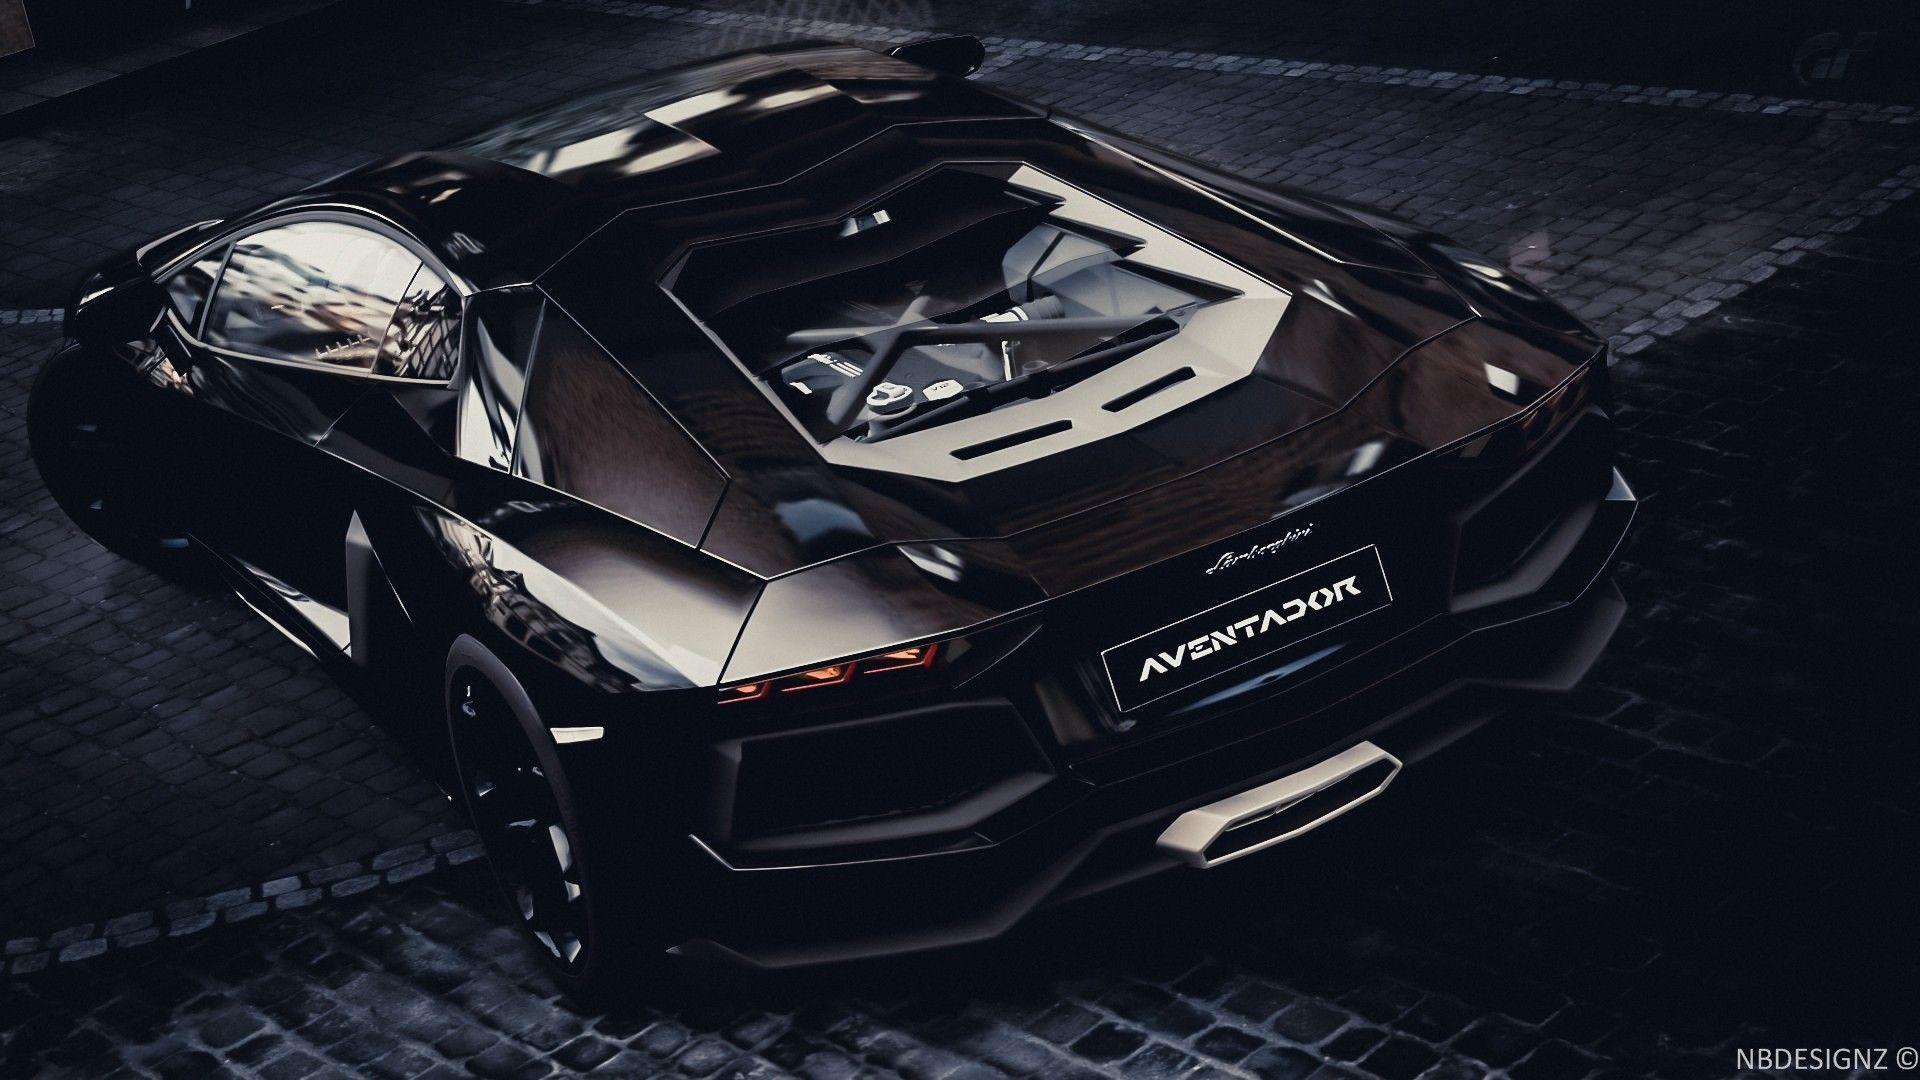 Lamborghini Aventador Transformers Google Search Lamborghini Pictures Lamborghini Aventador Lamborghini Aventador Wallpaper